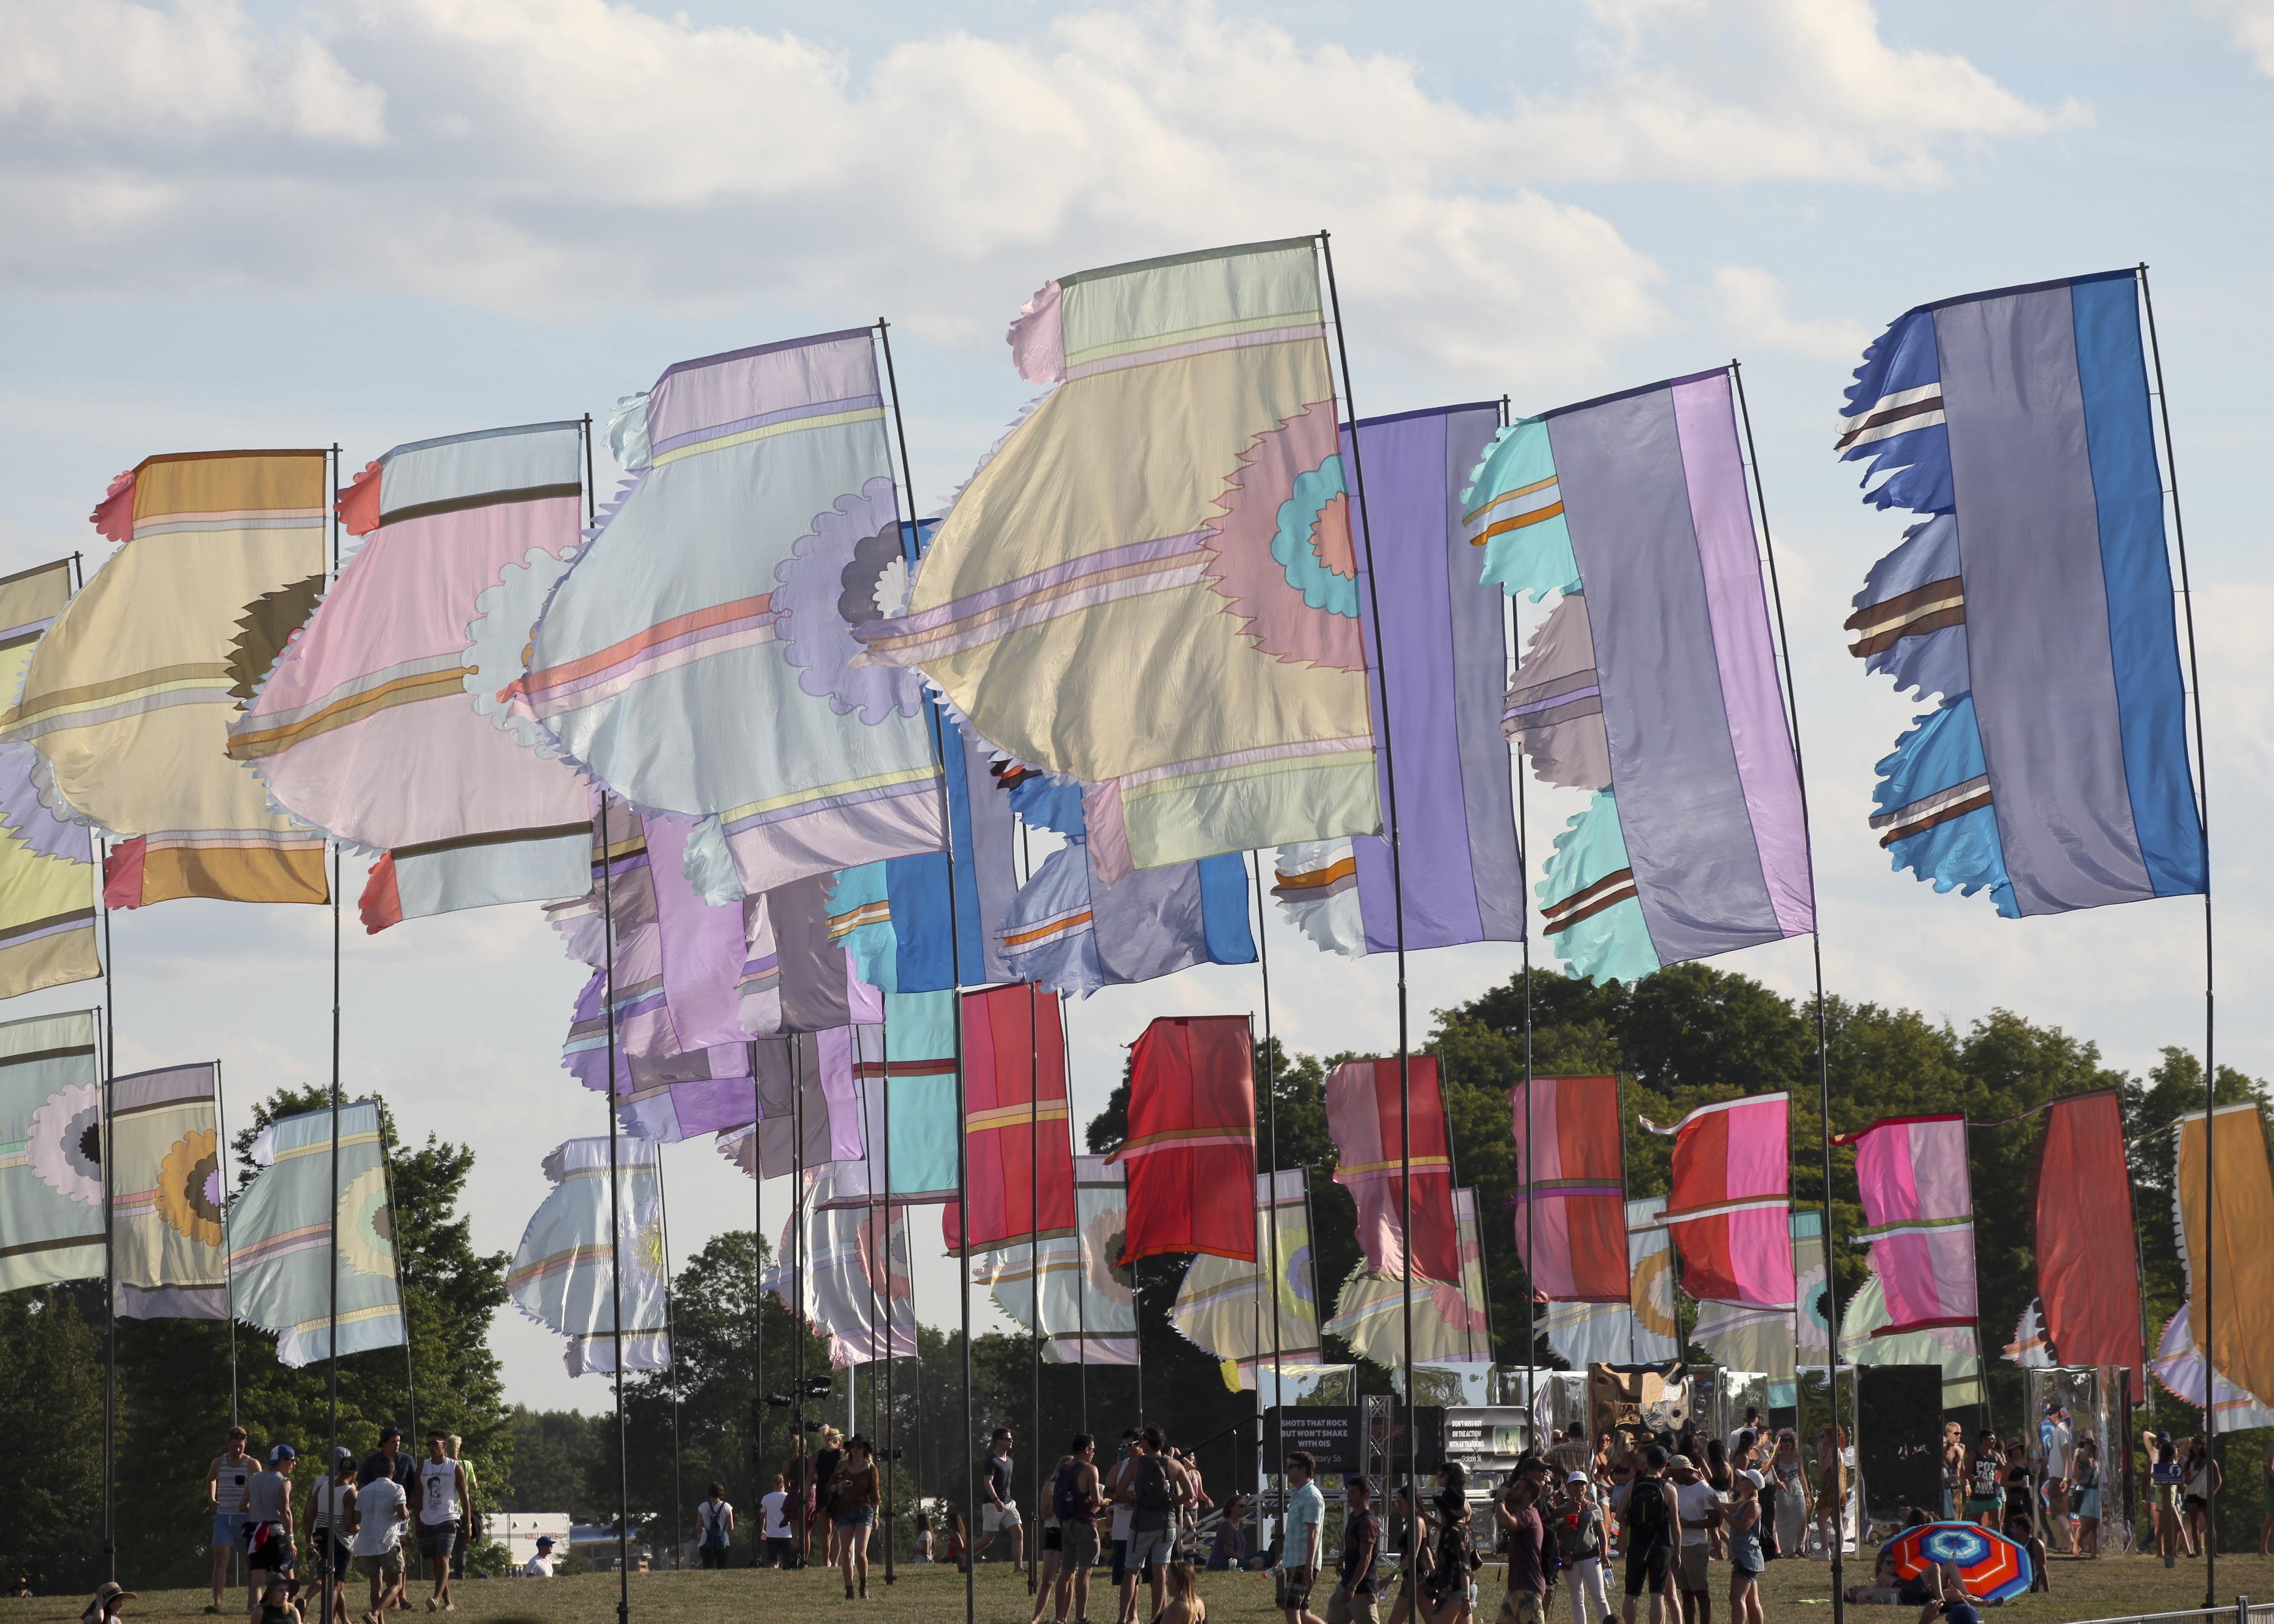 WayHome Festival